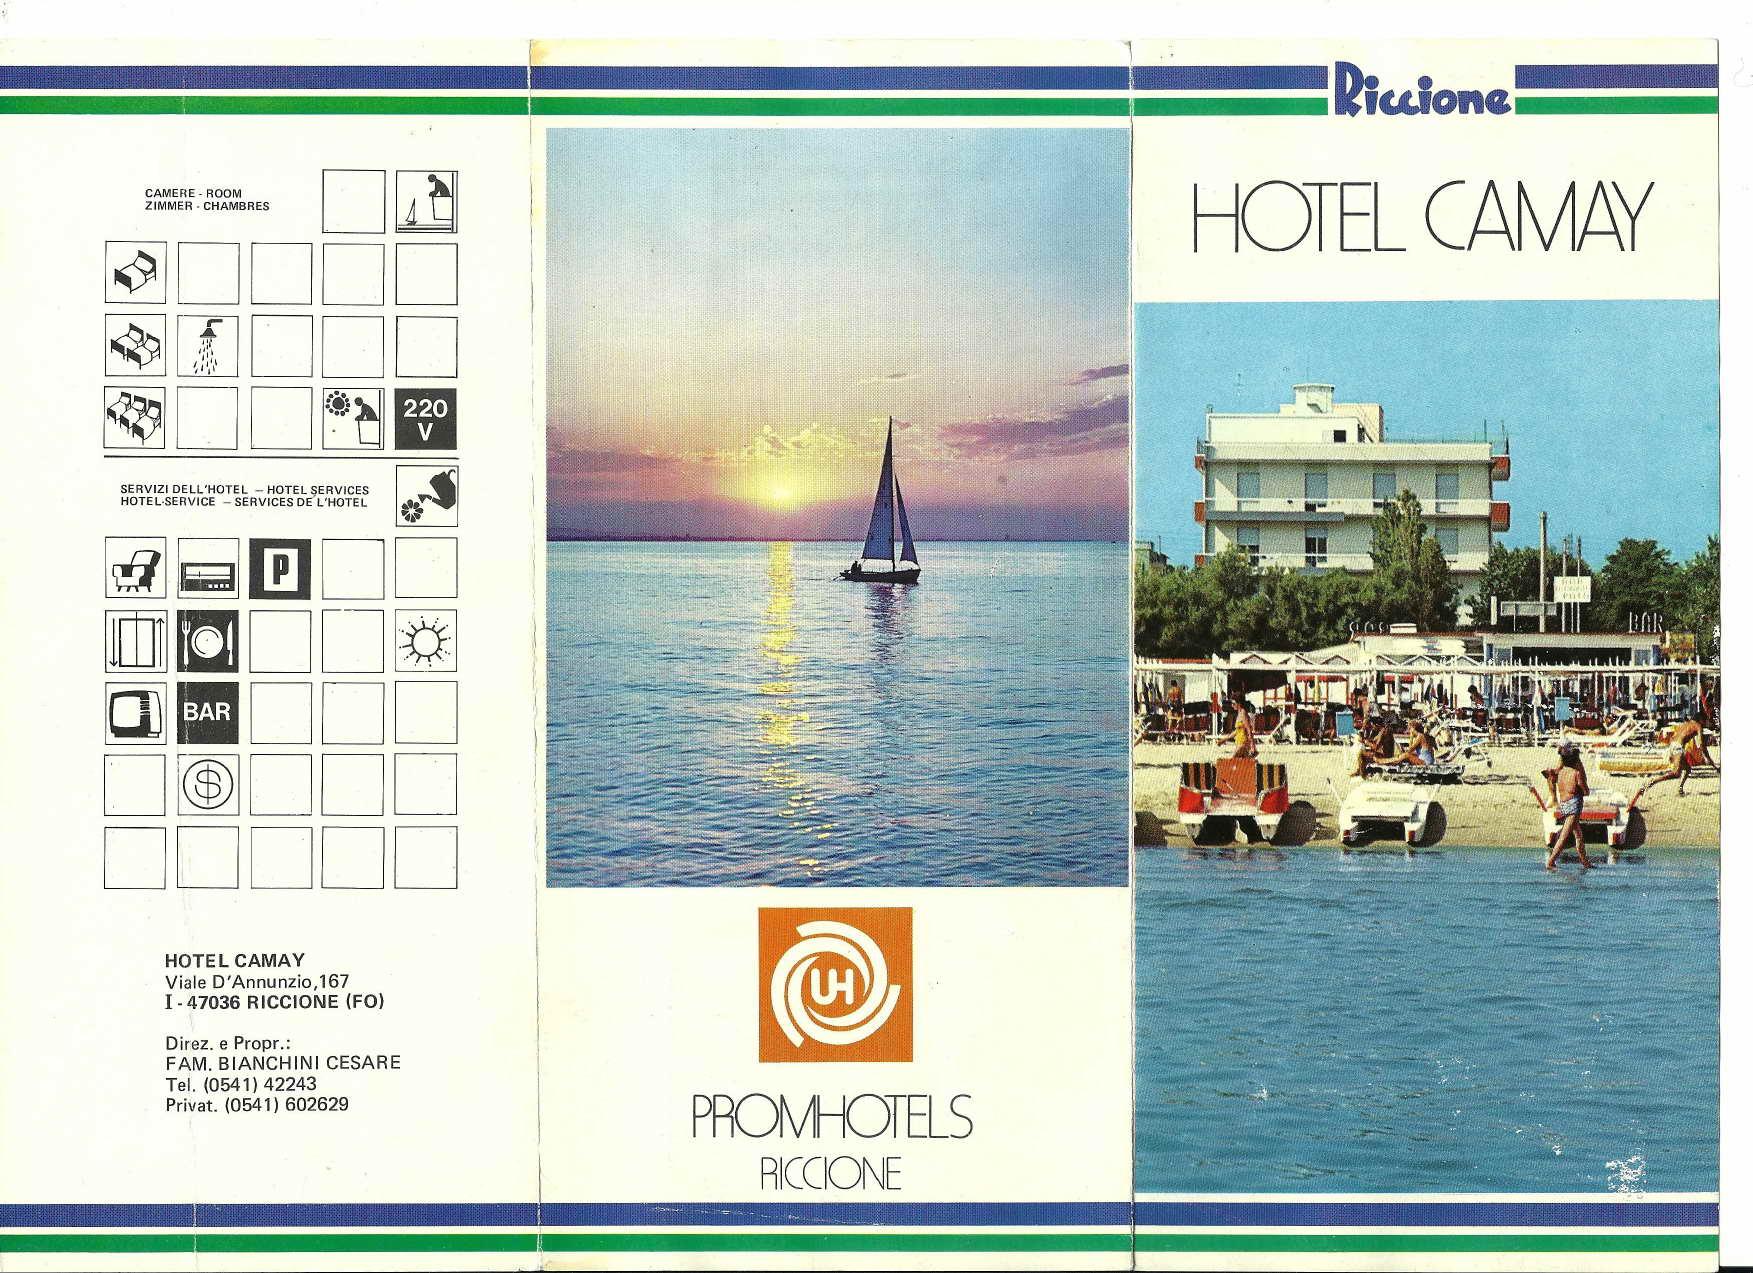 Depliand anni90 2 page 0001 Riccione Hotel Camay Vintage anni 8217 80